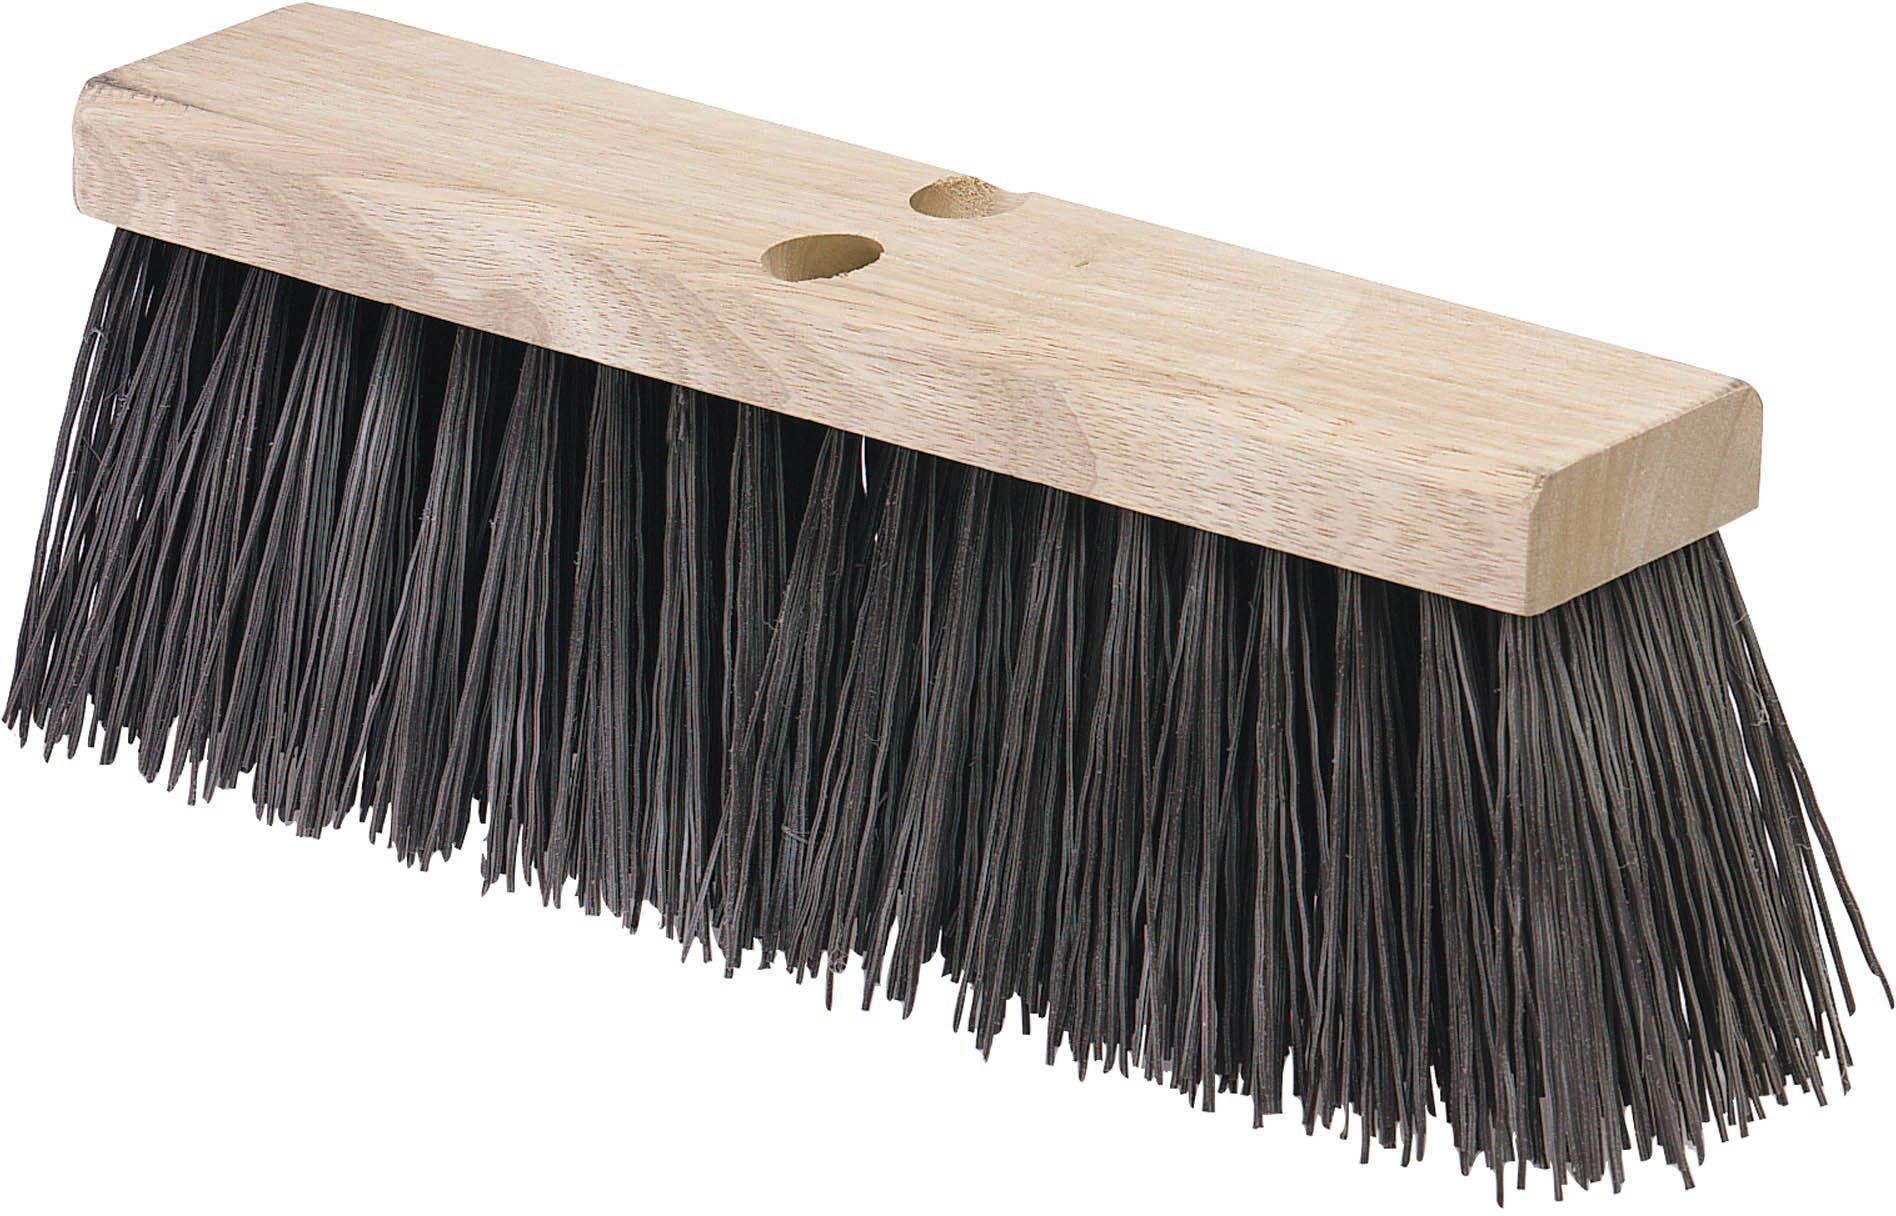 Carlisle 3611302401 Flo-Pac Hardwood Block Floor Sweep, Heavy Polypropylene Bristles, 5.13'' Bristle Trim, 24'' Length, Brown by Carlisle (Image #1)